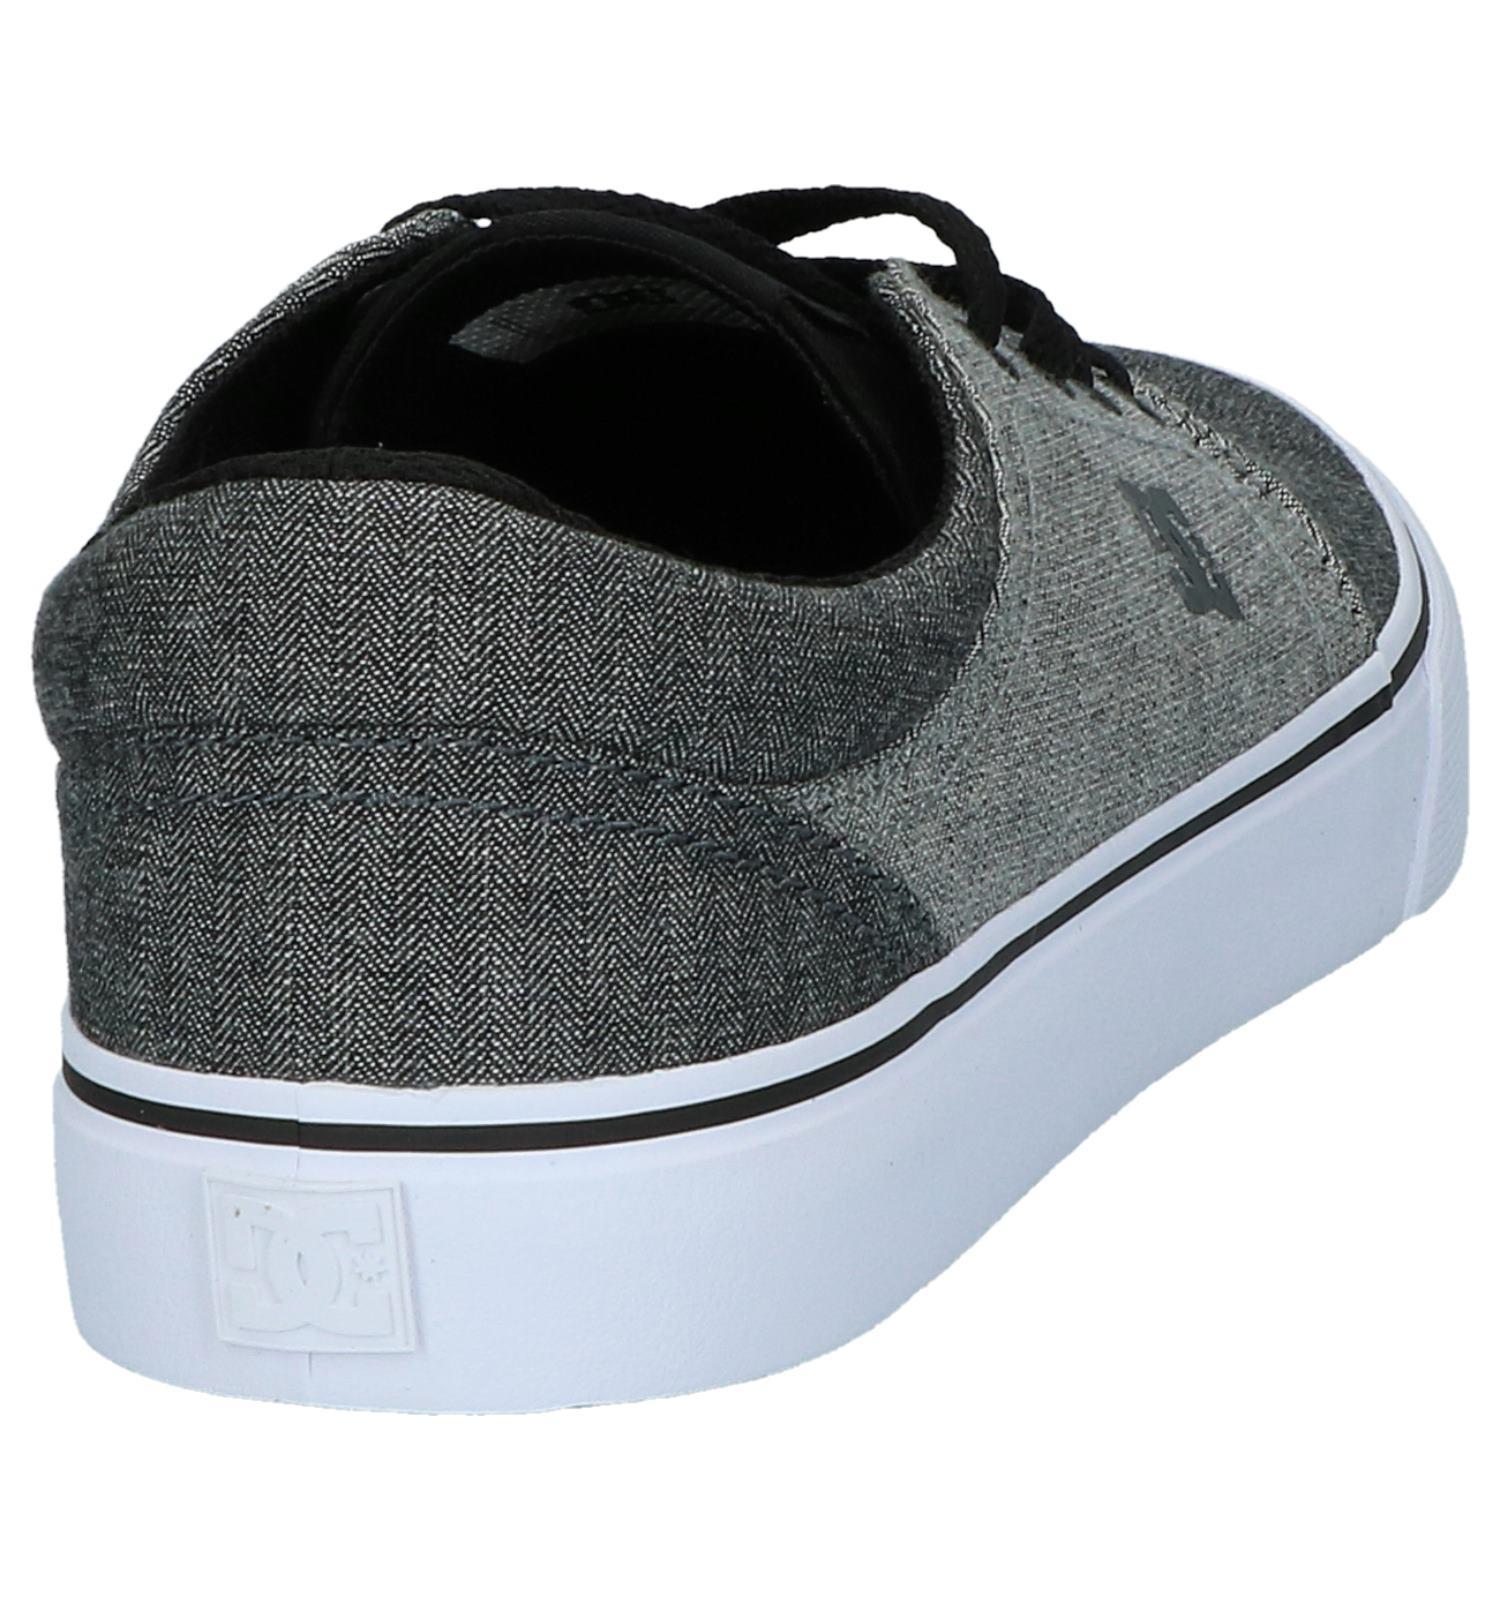 Grijze Donker Shoes Skateschoenen Trase Tx Dc BWEQreCxod